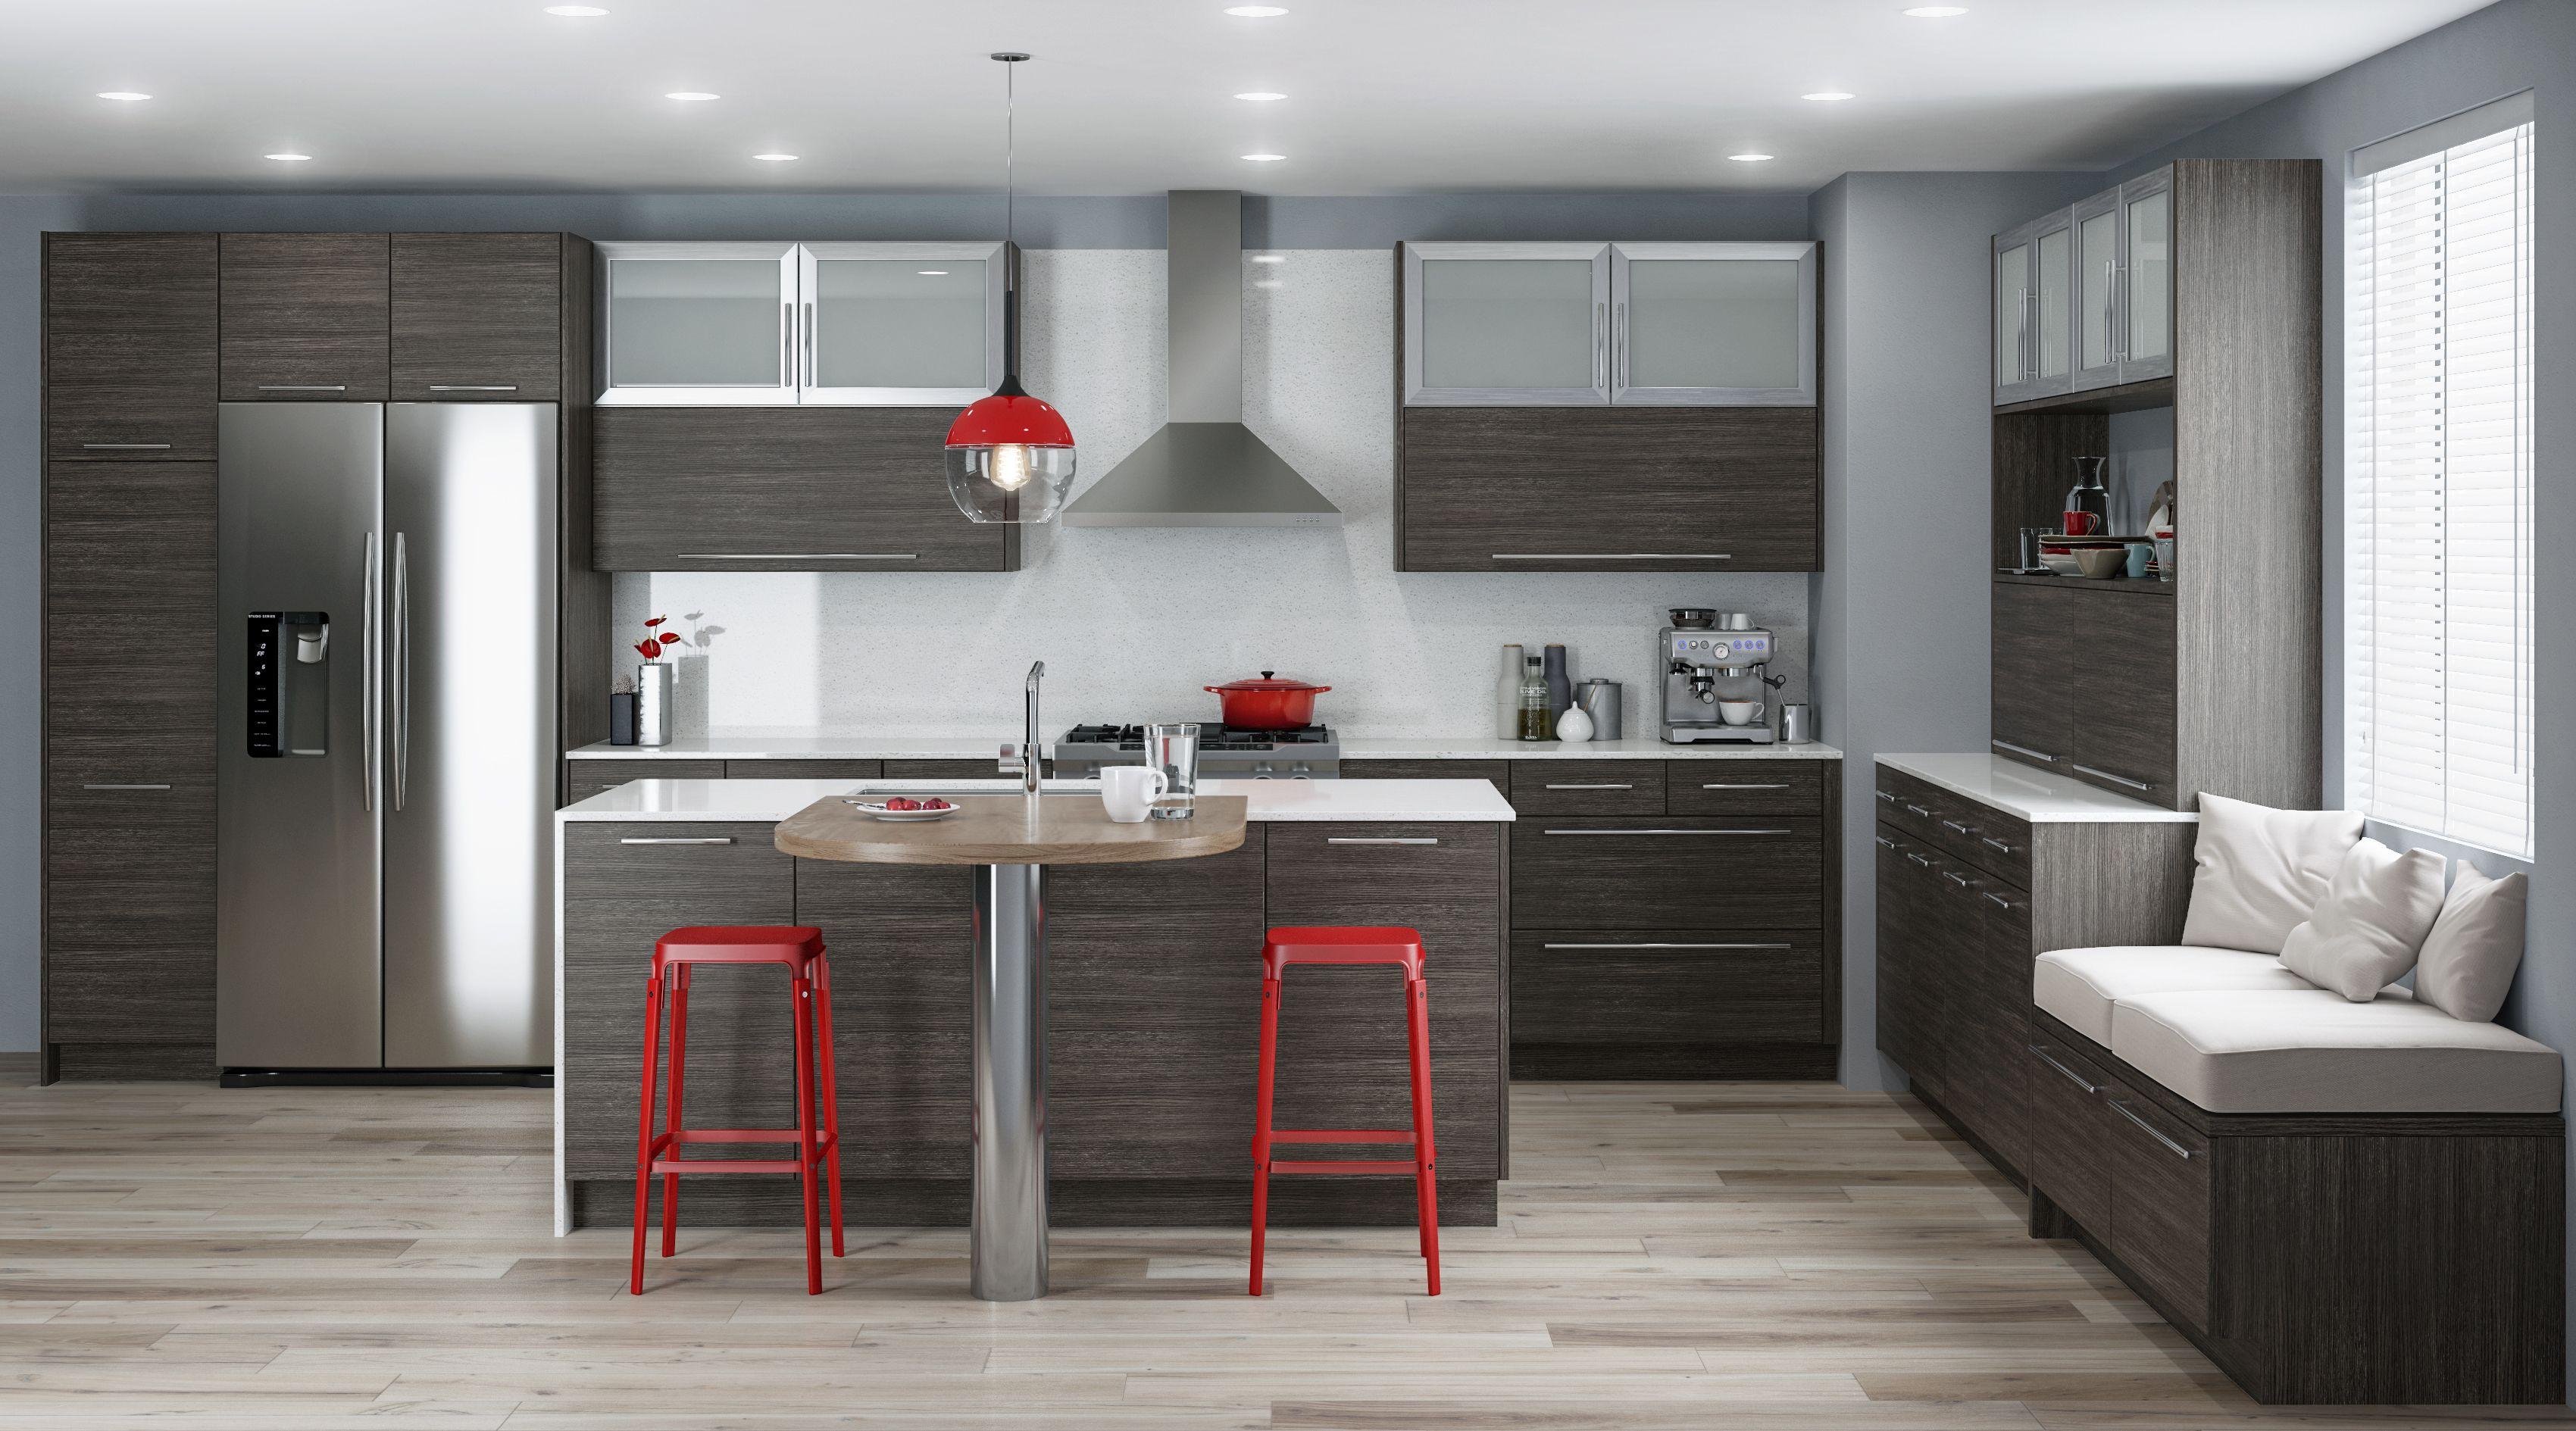 Moda Textured Laminate Ash Coastal Kitchen Cabinets Kitchen Cabinets Contemporary Walnut Kitchen